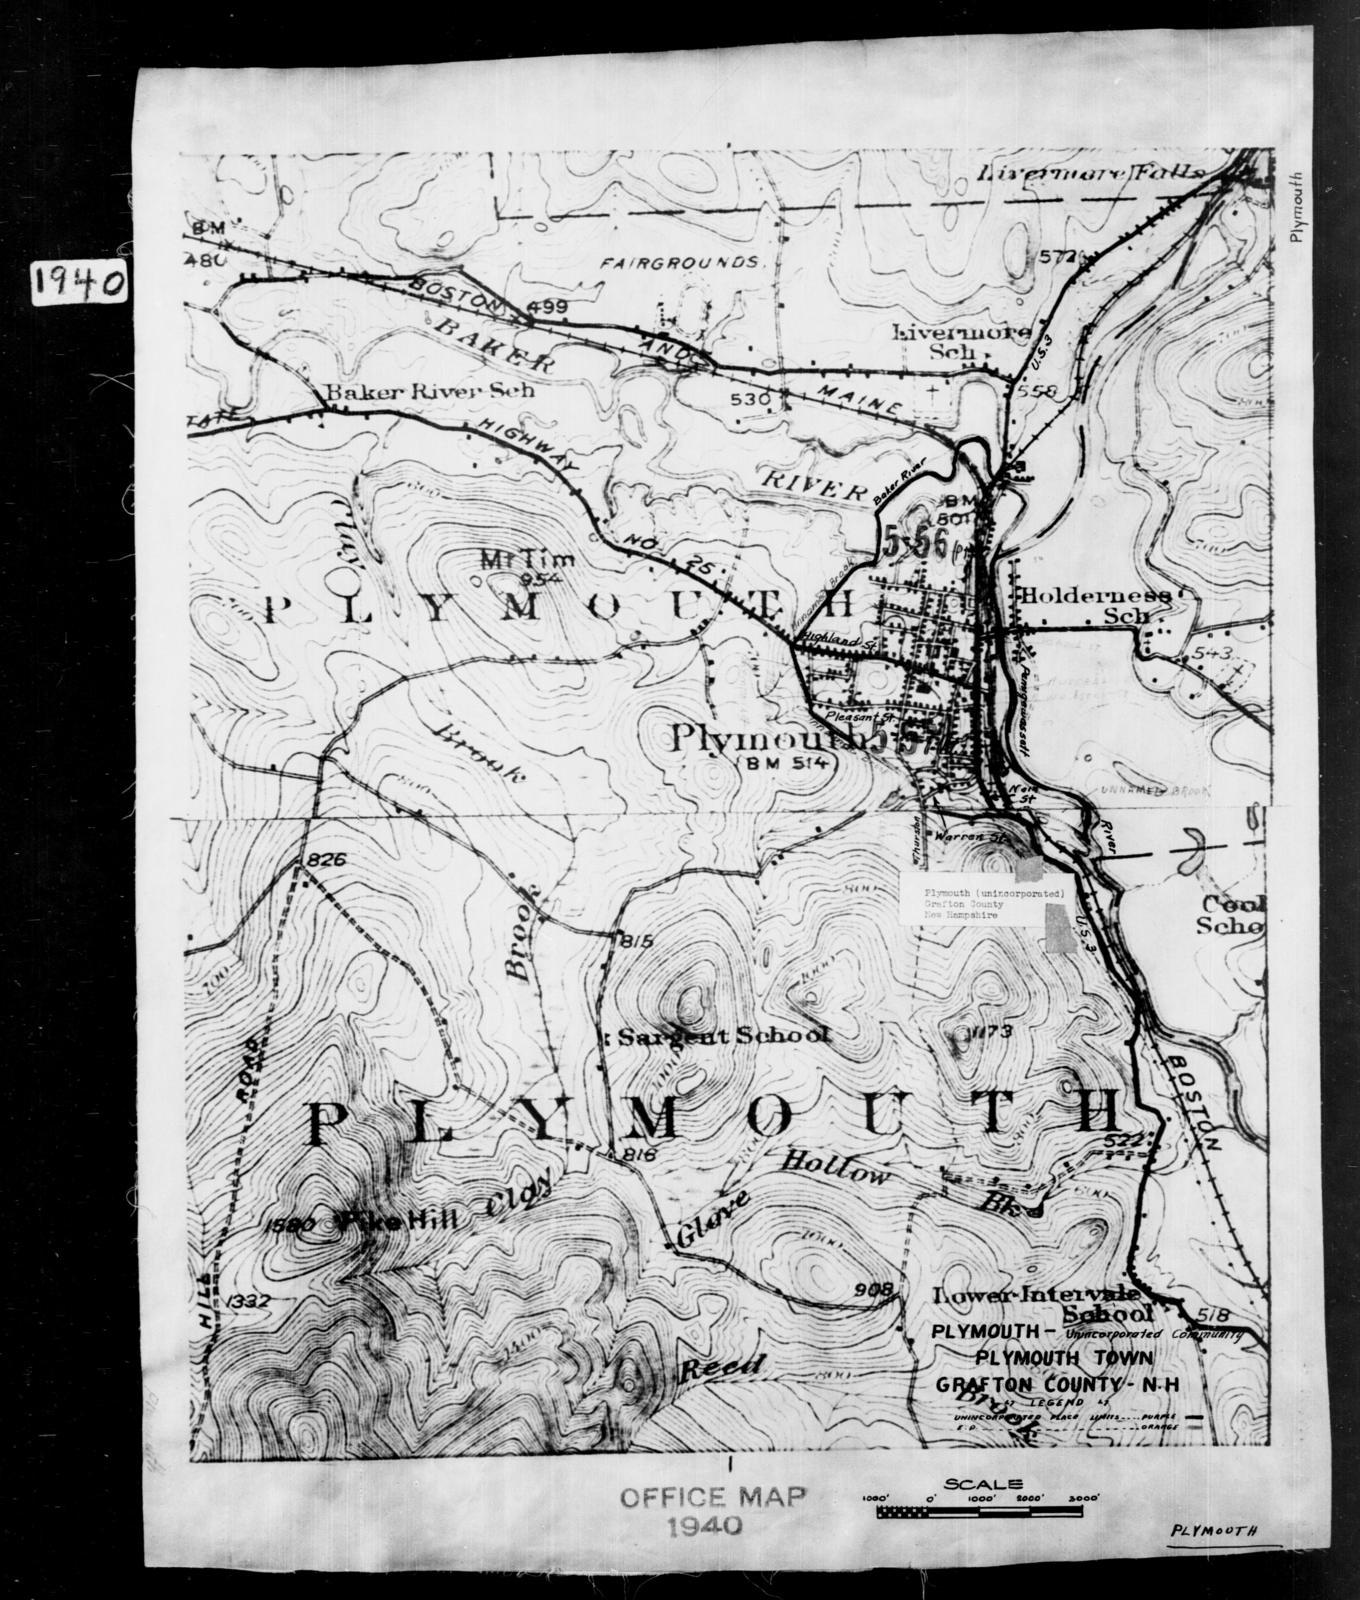 1940 Census Enumeration District Maps - New Hampshire - Grafton